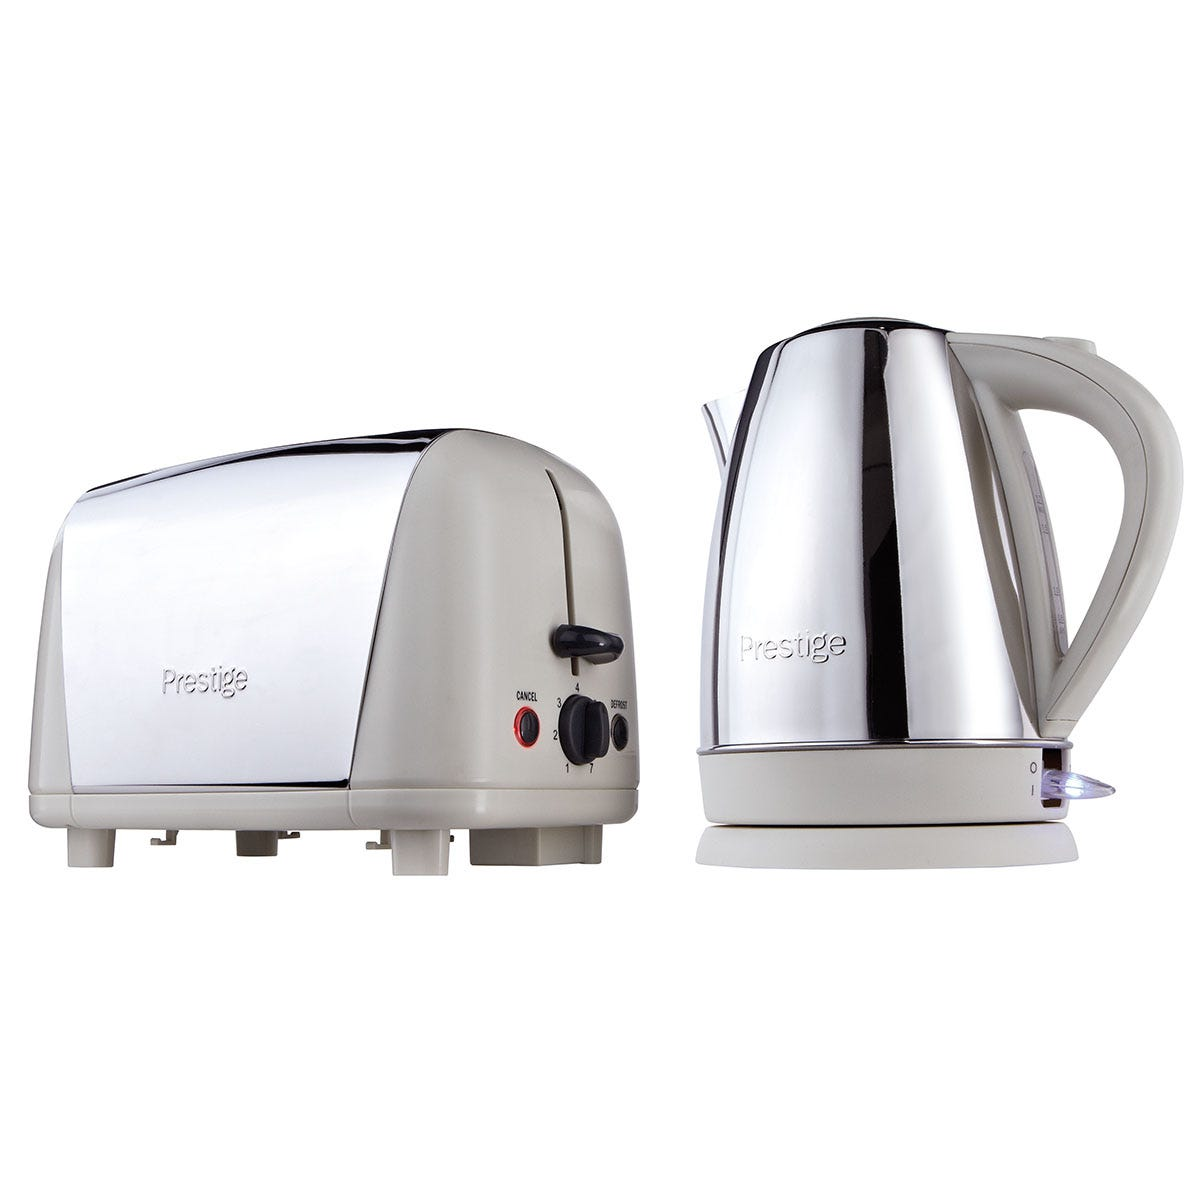 Prestige 53233 Breakfast Kettle and Toaster Set - Almond